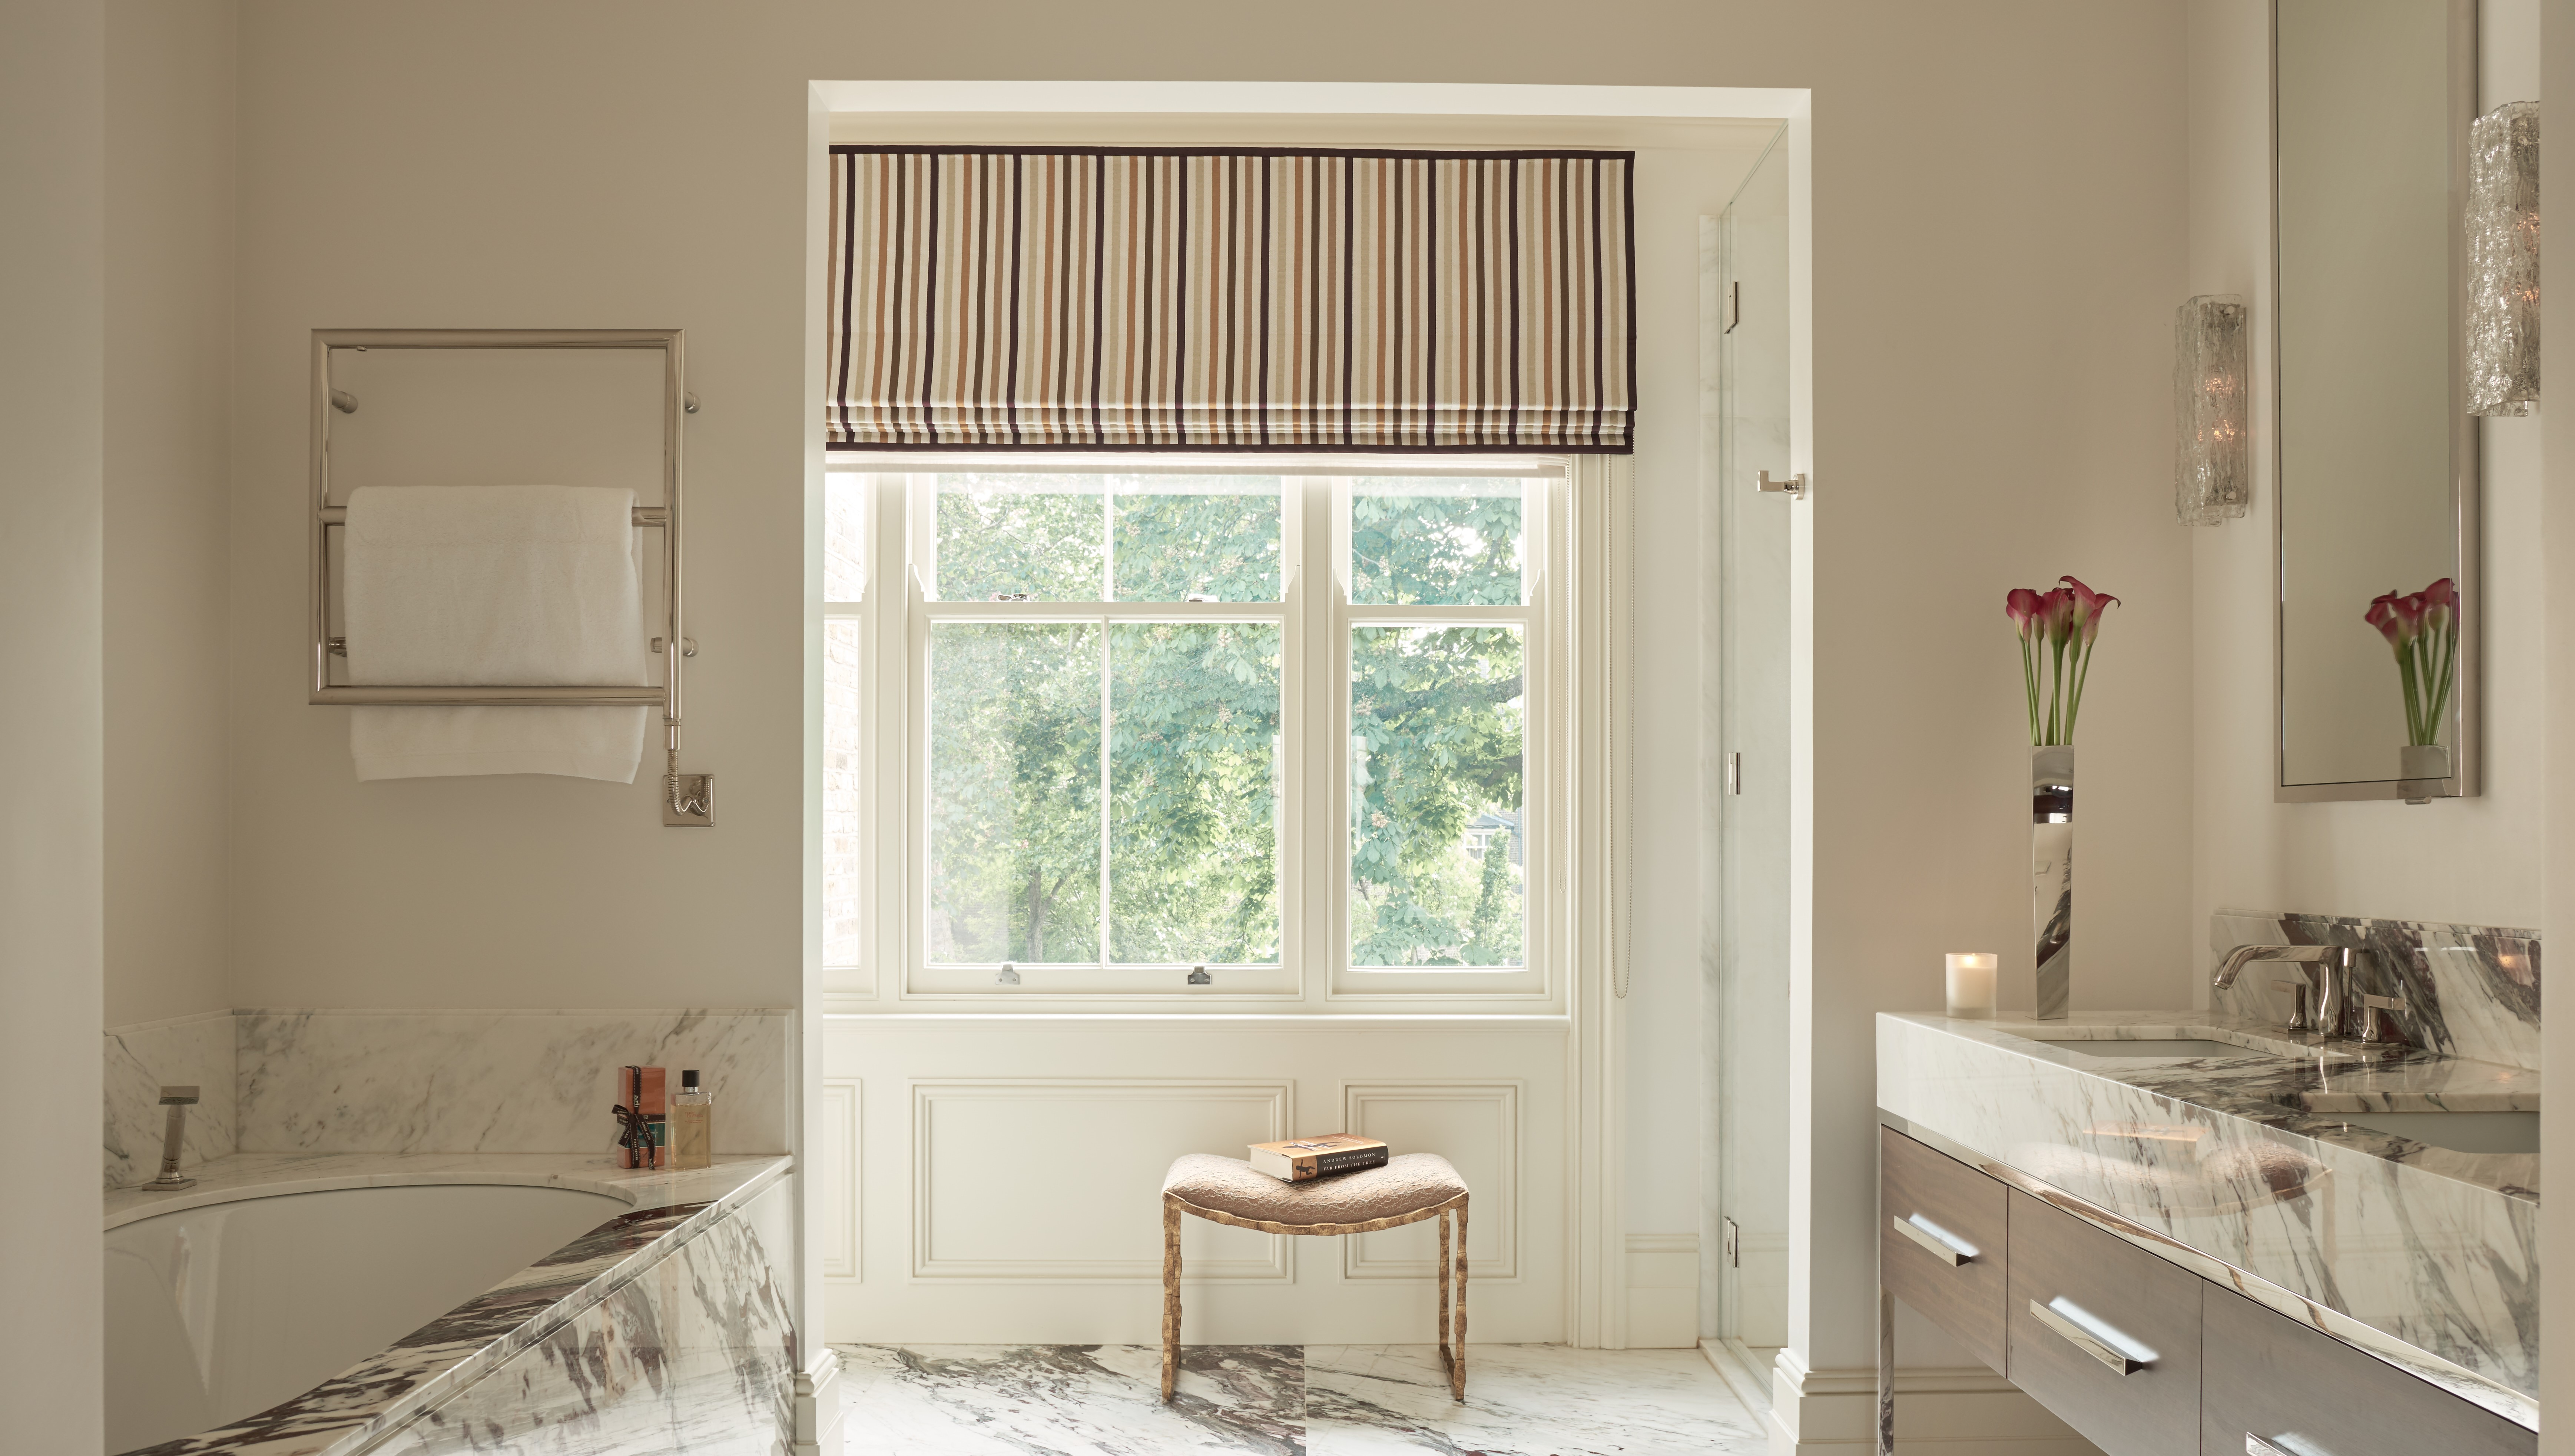 Secure sash windows furniture in bathroom